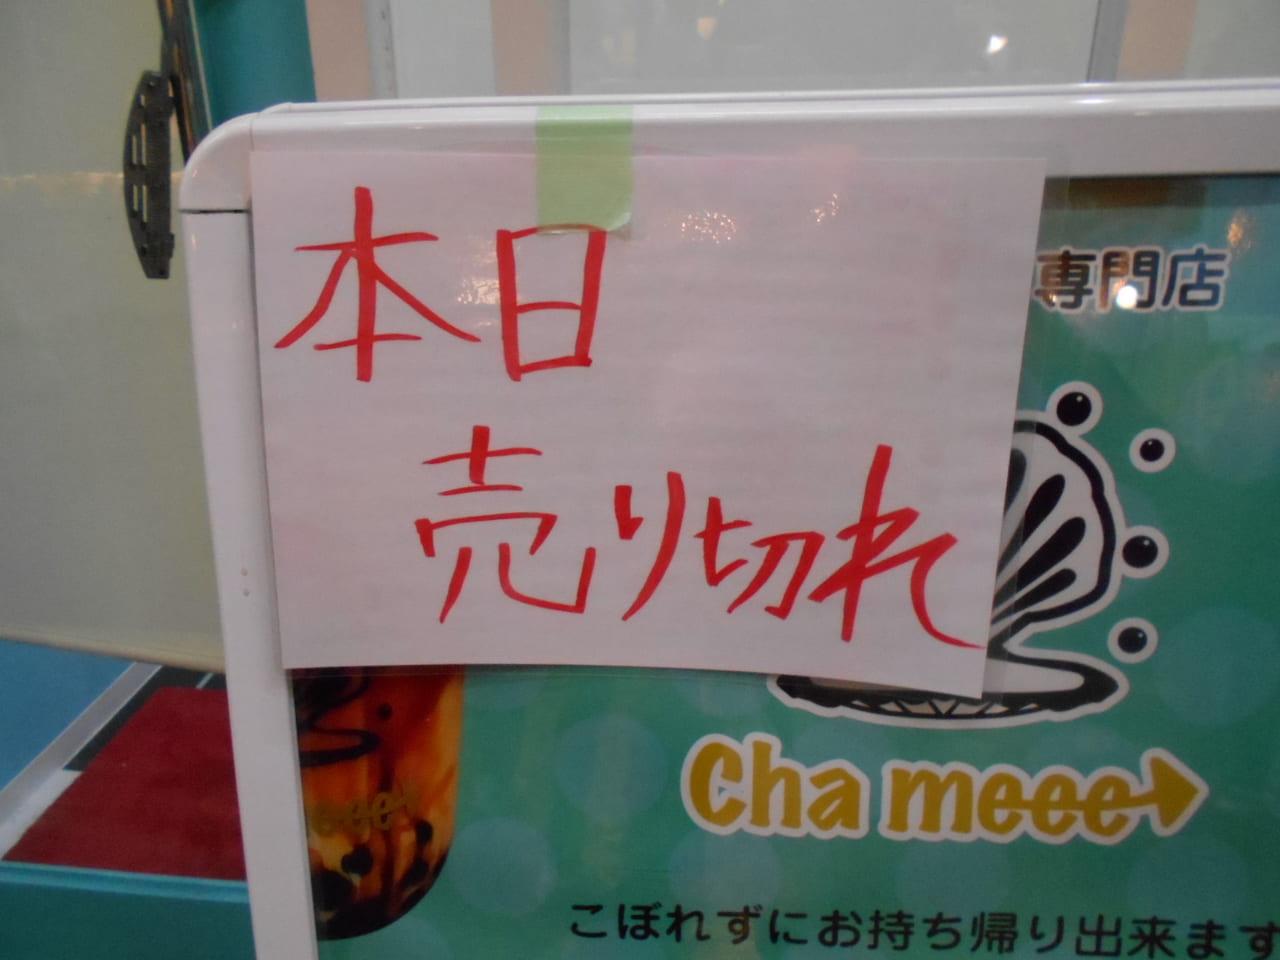 chameee